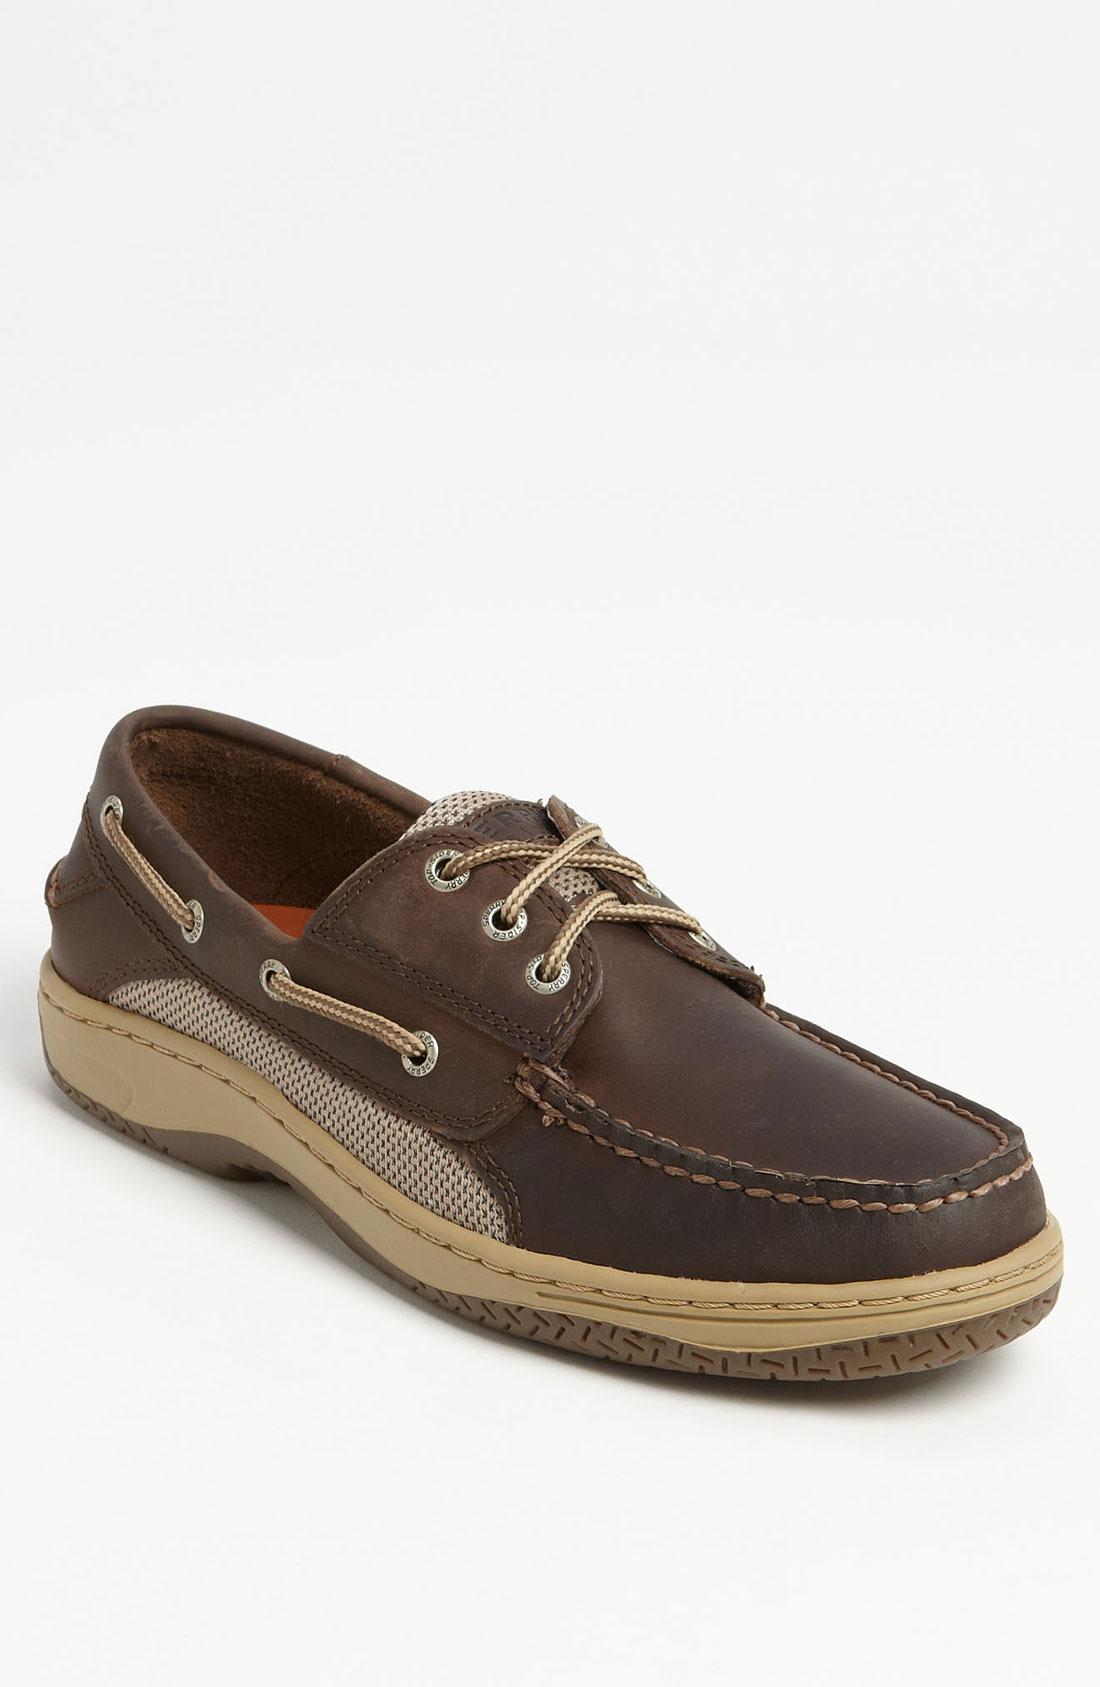 Dark Brown Boat Shoes